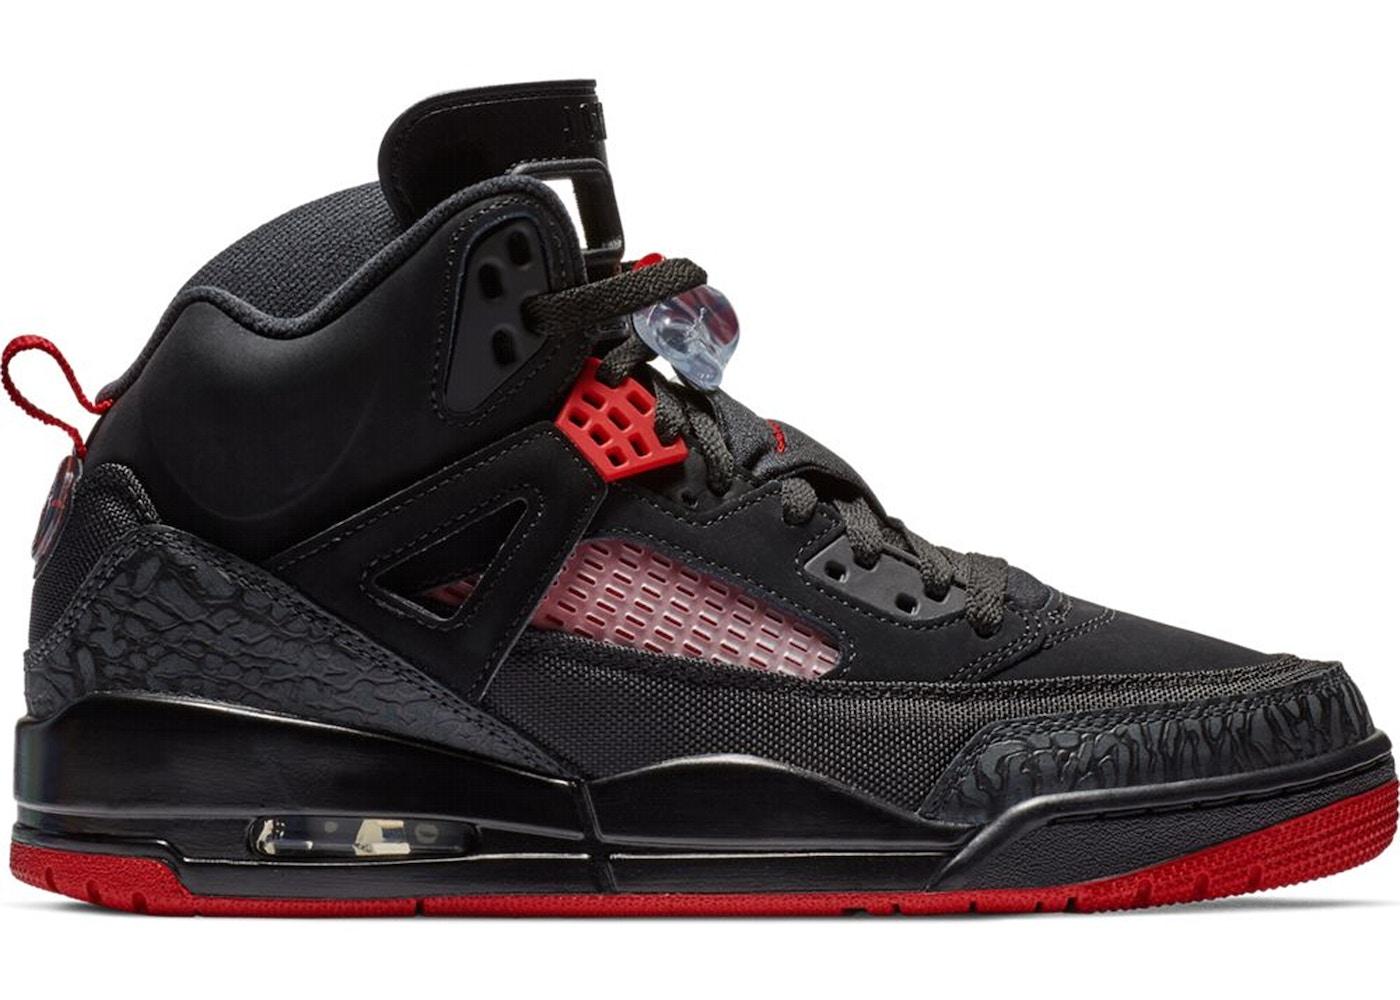 brand new c691e f1d2b Jordan Spizike Black Gym Red